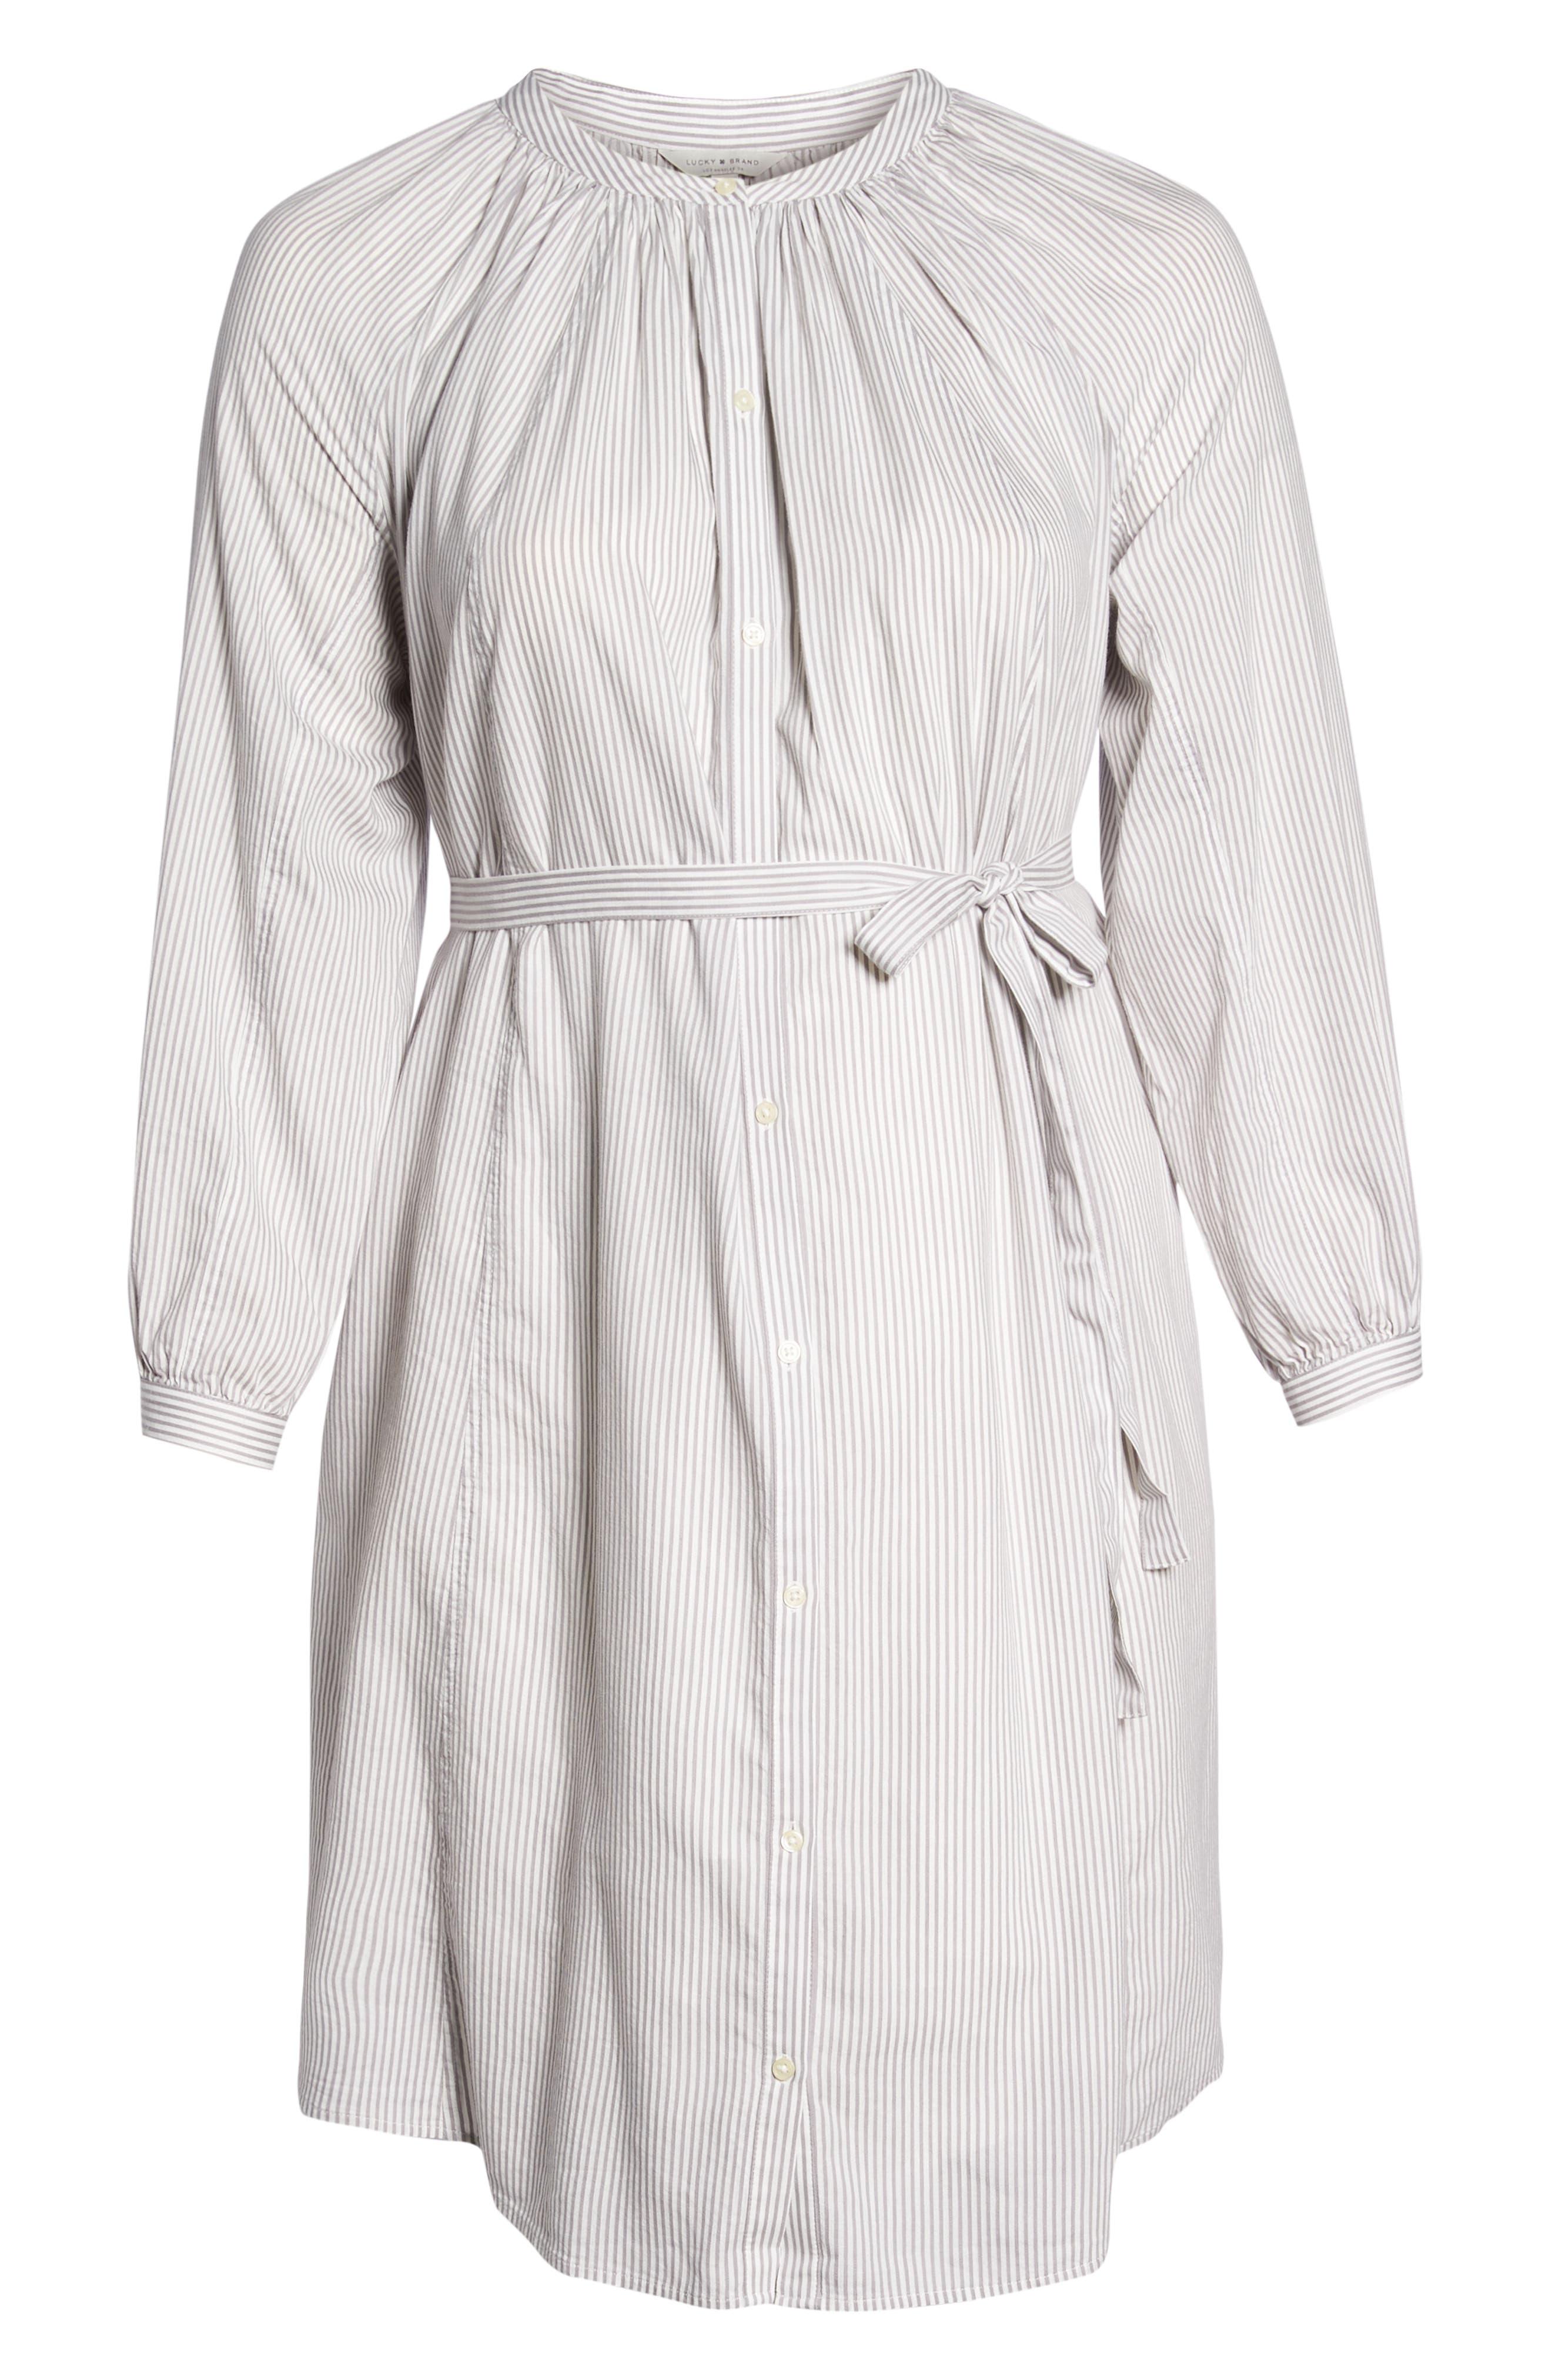 Stripe Peasant Dress,                             Alternate thumbnail 7, color,                             Grey Multi